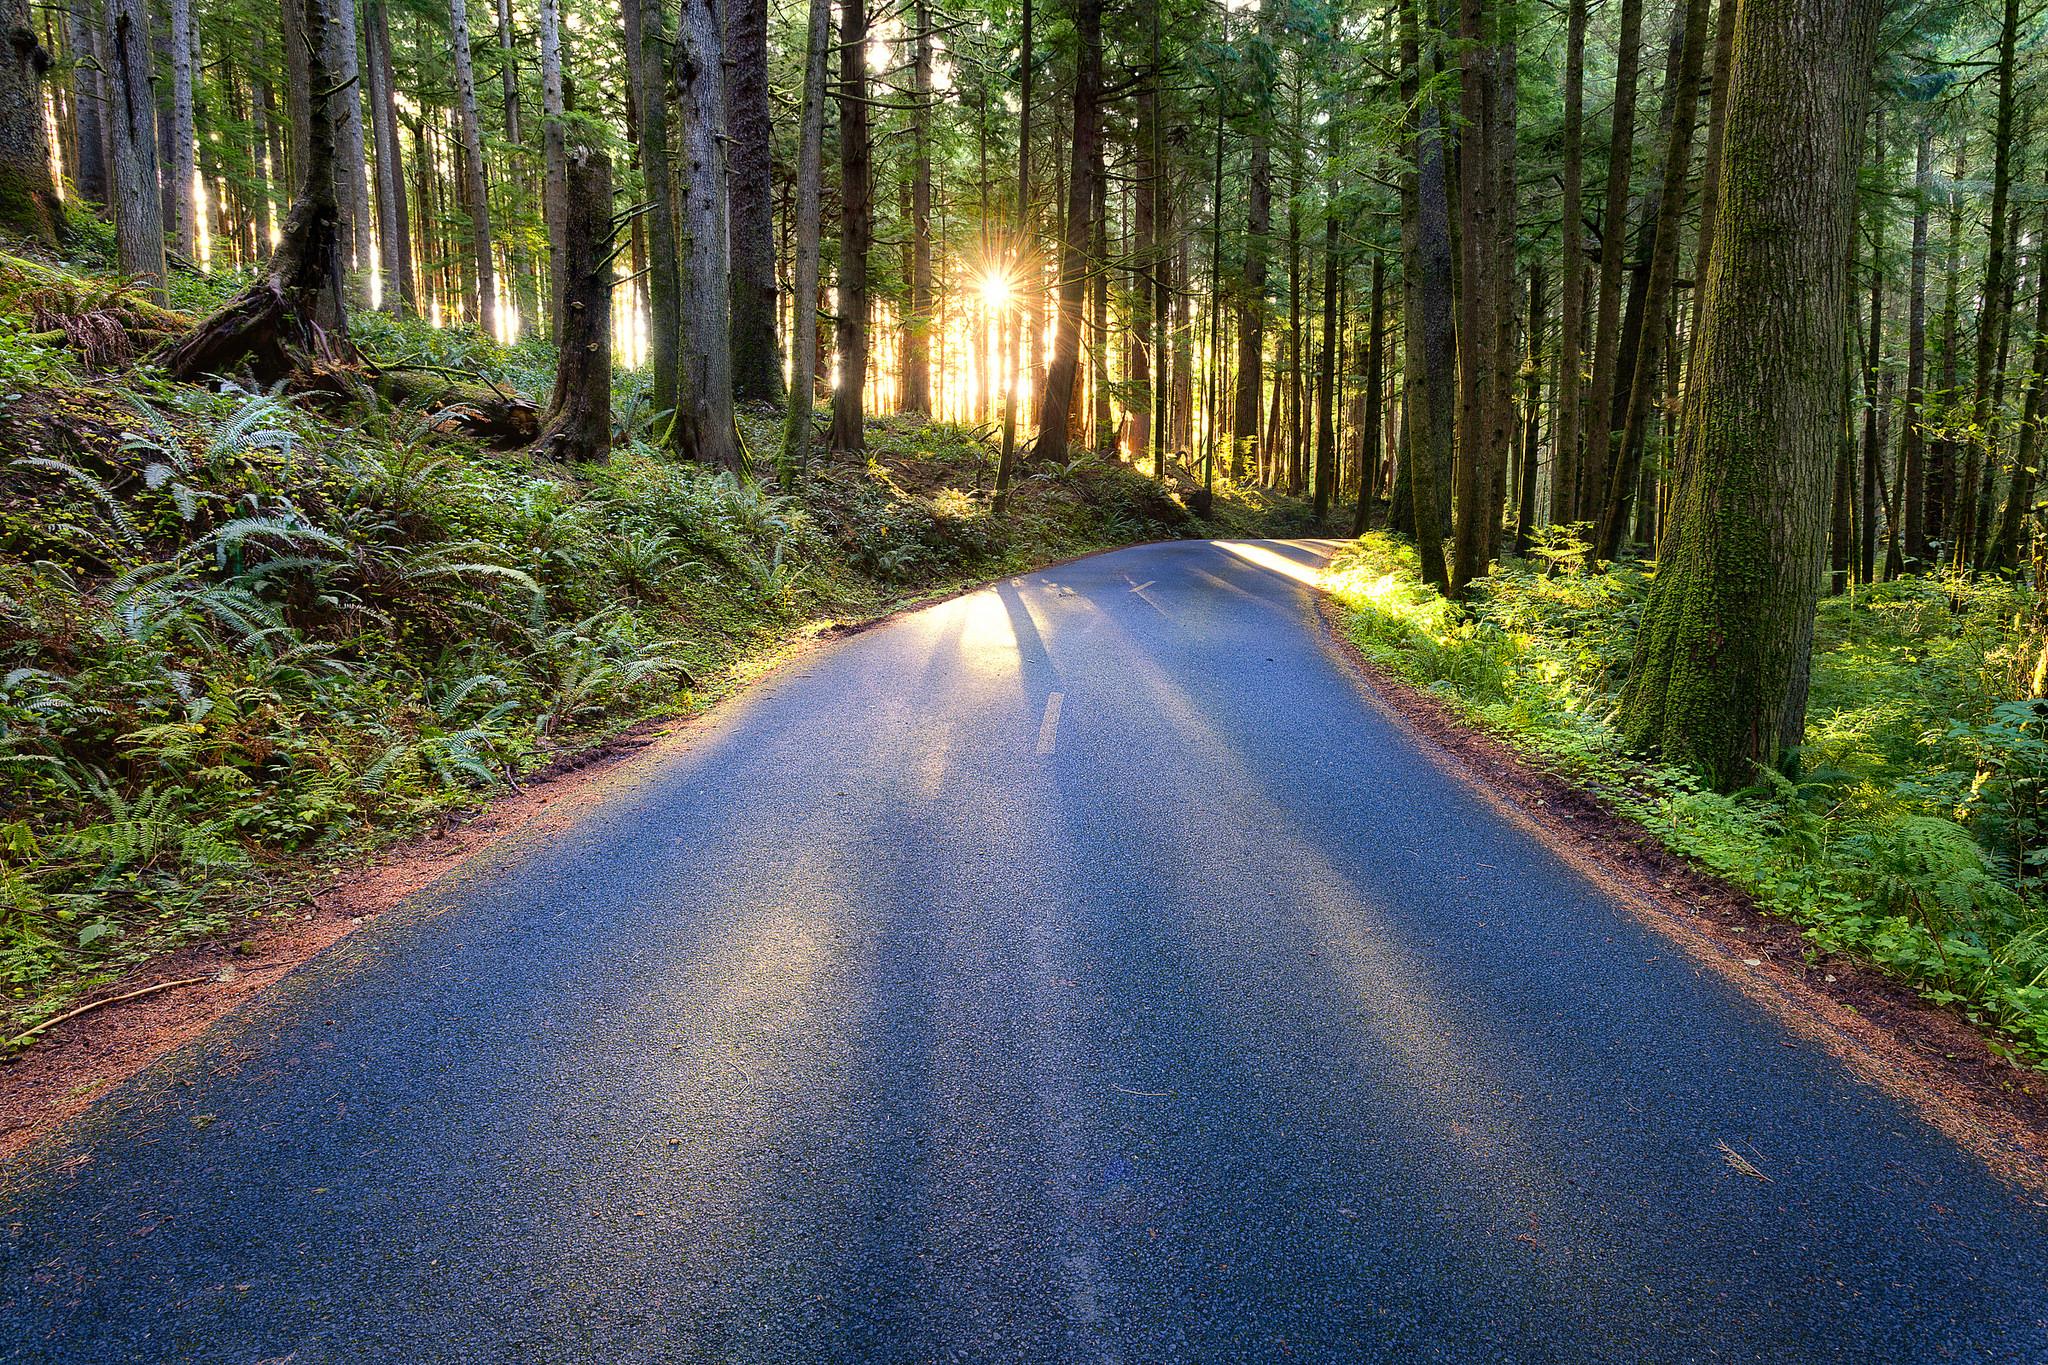 Forest Road in Oregon by Michael Matti